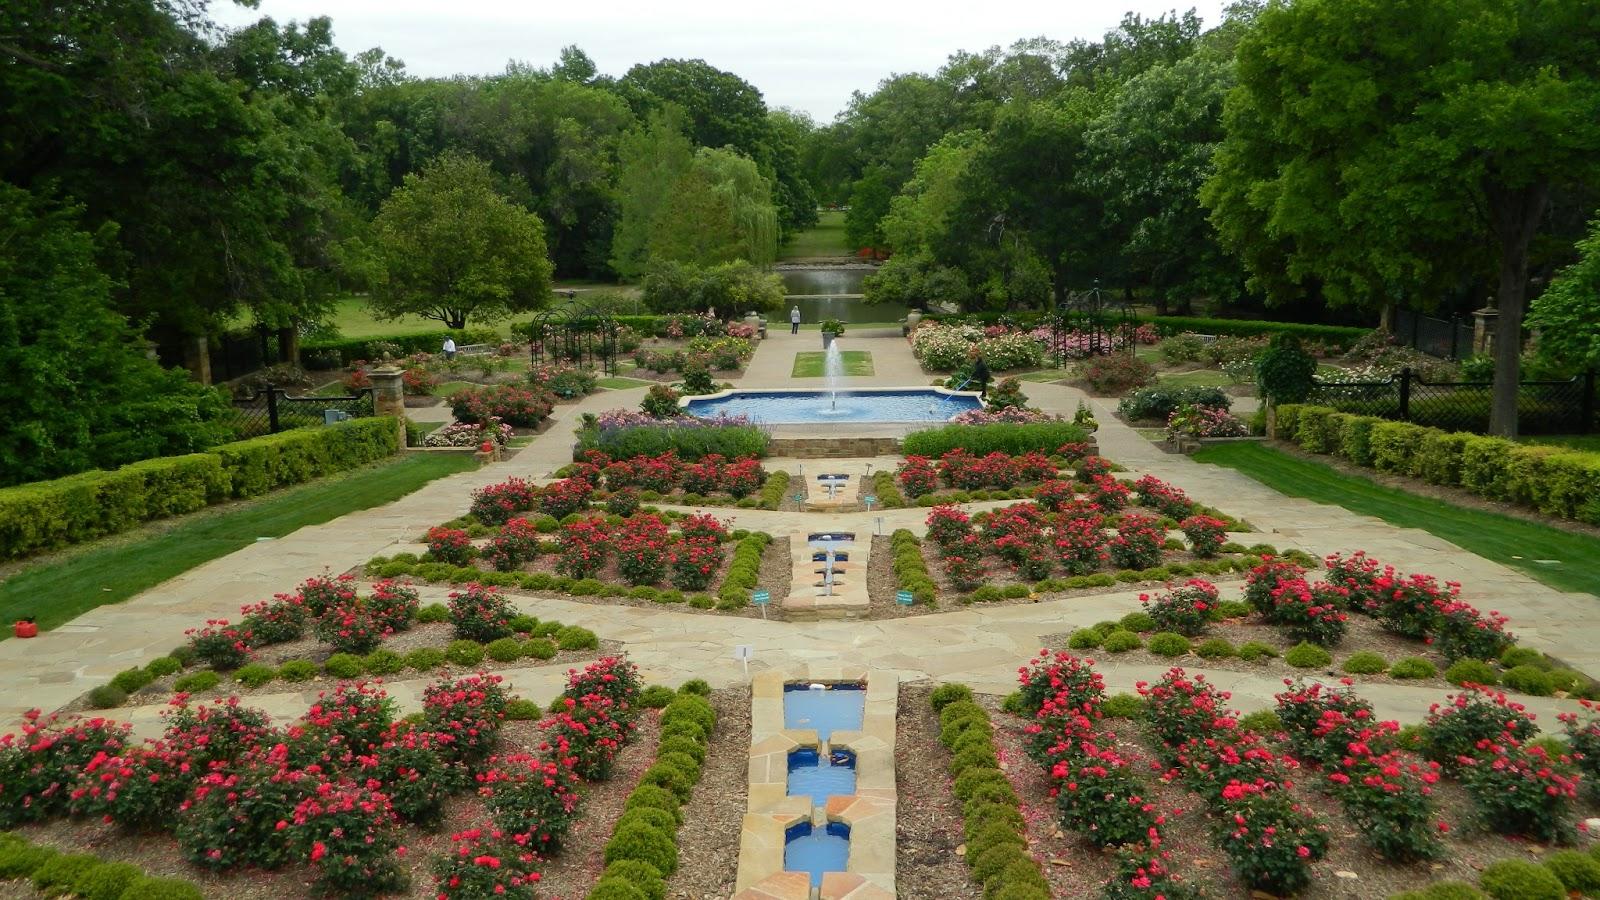 GardenEnvy: This Texas Botanical Garden Is So Worth A Visit